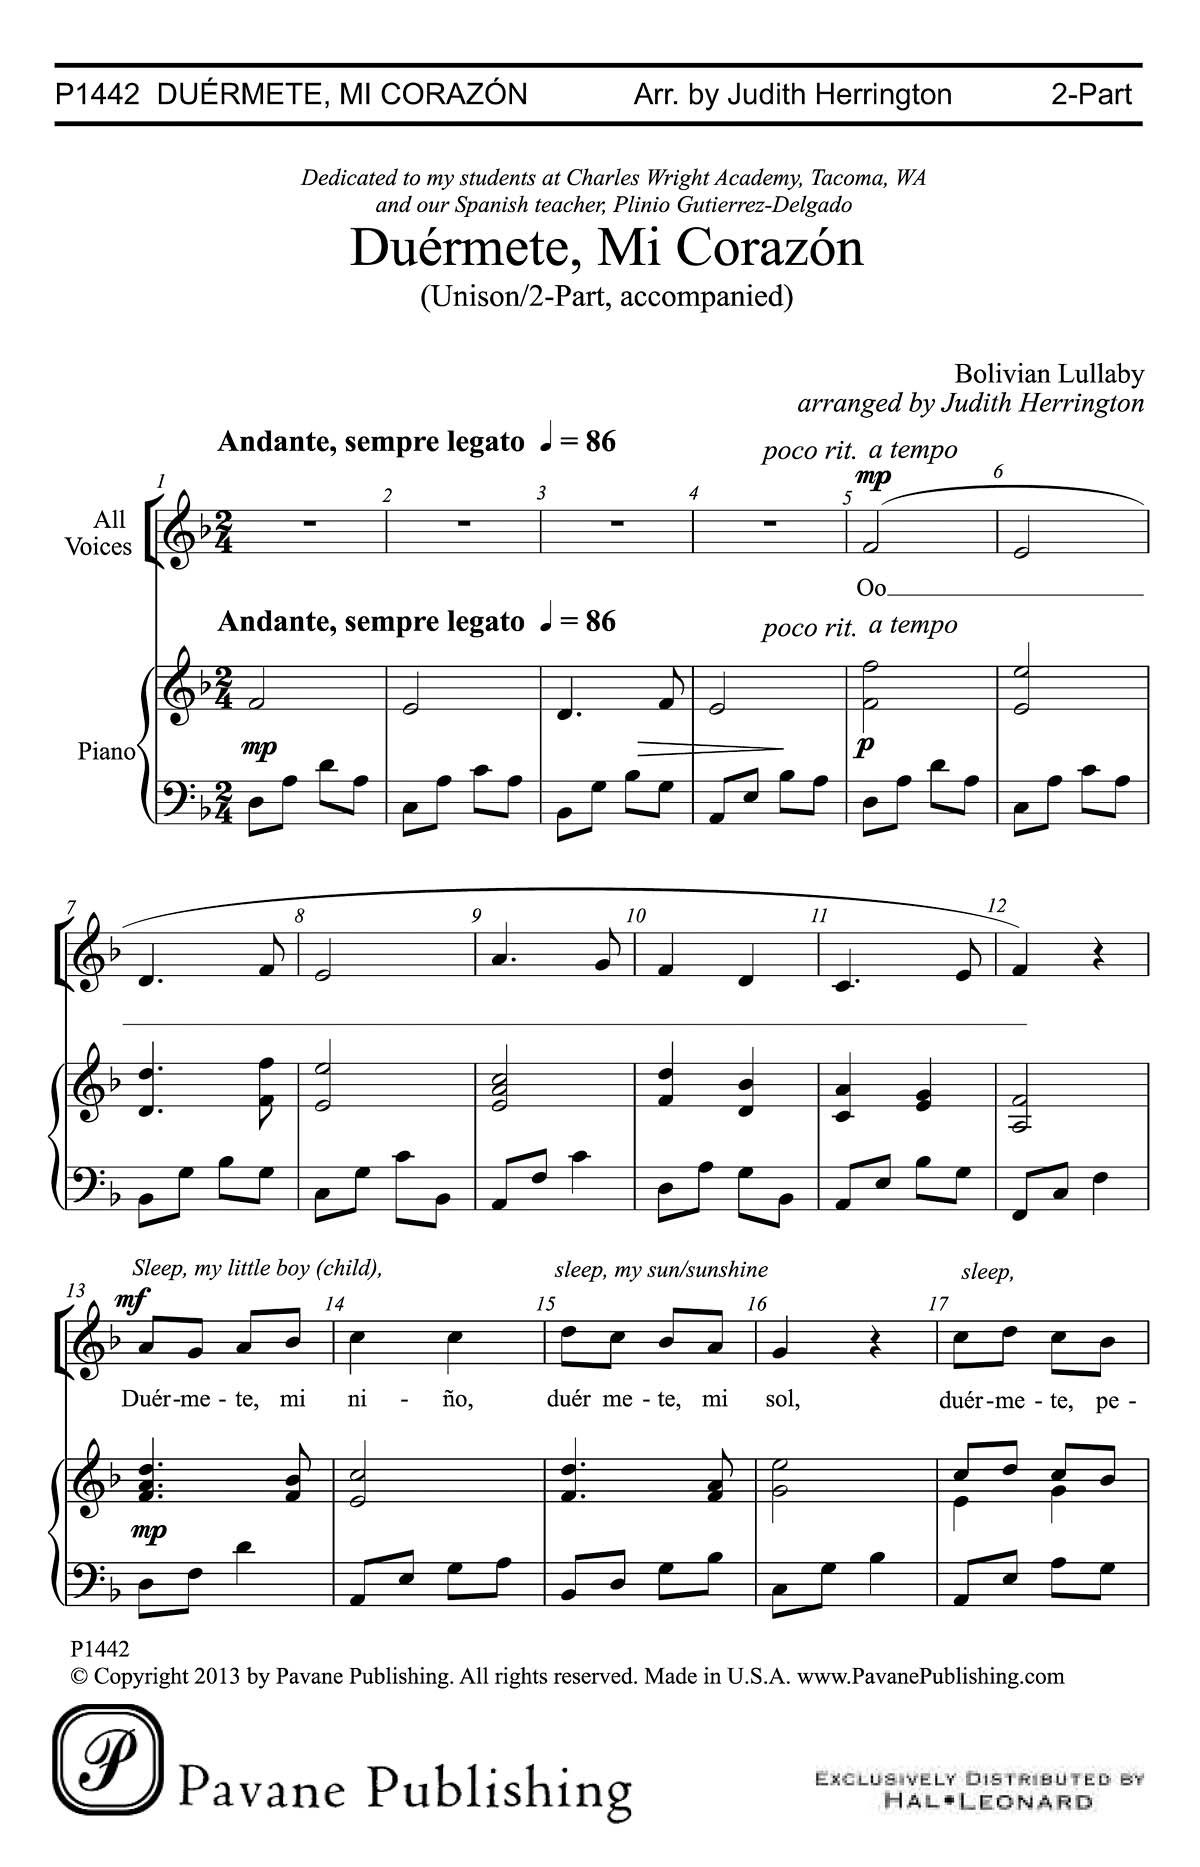 Pavane Publishing Duermete Mi Corazon - Bolivian Lullaby/Herrington ...